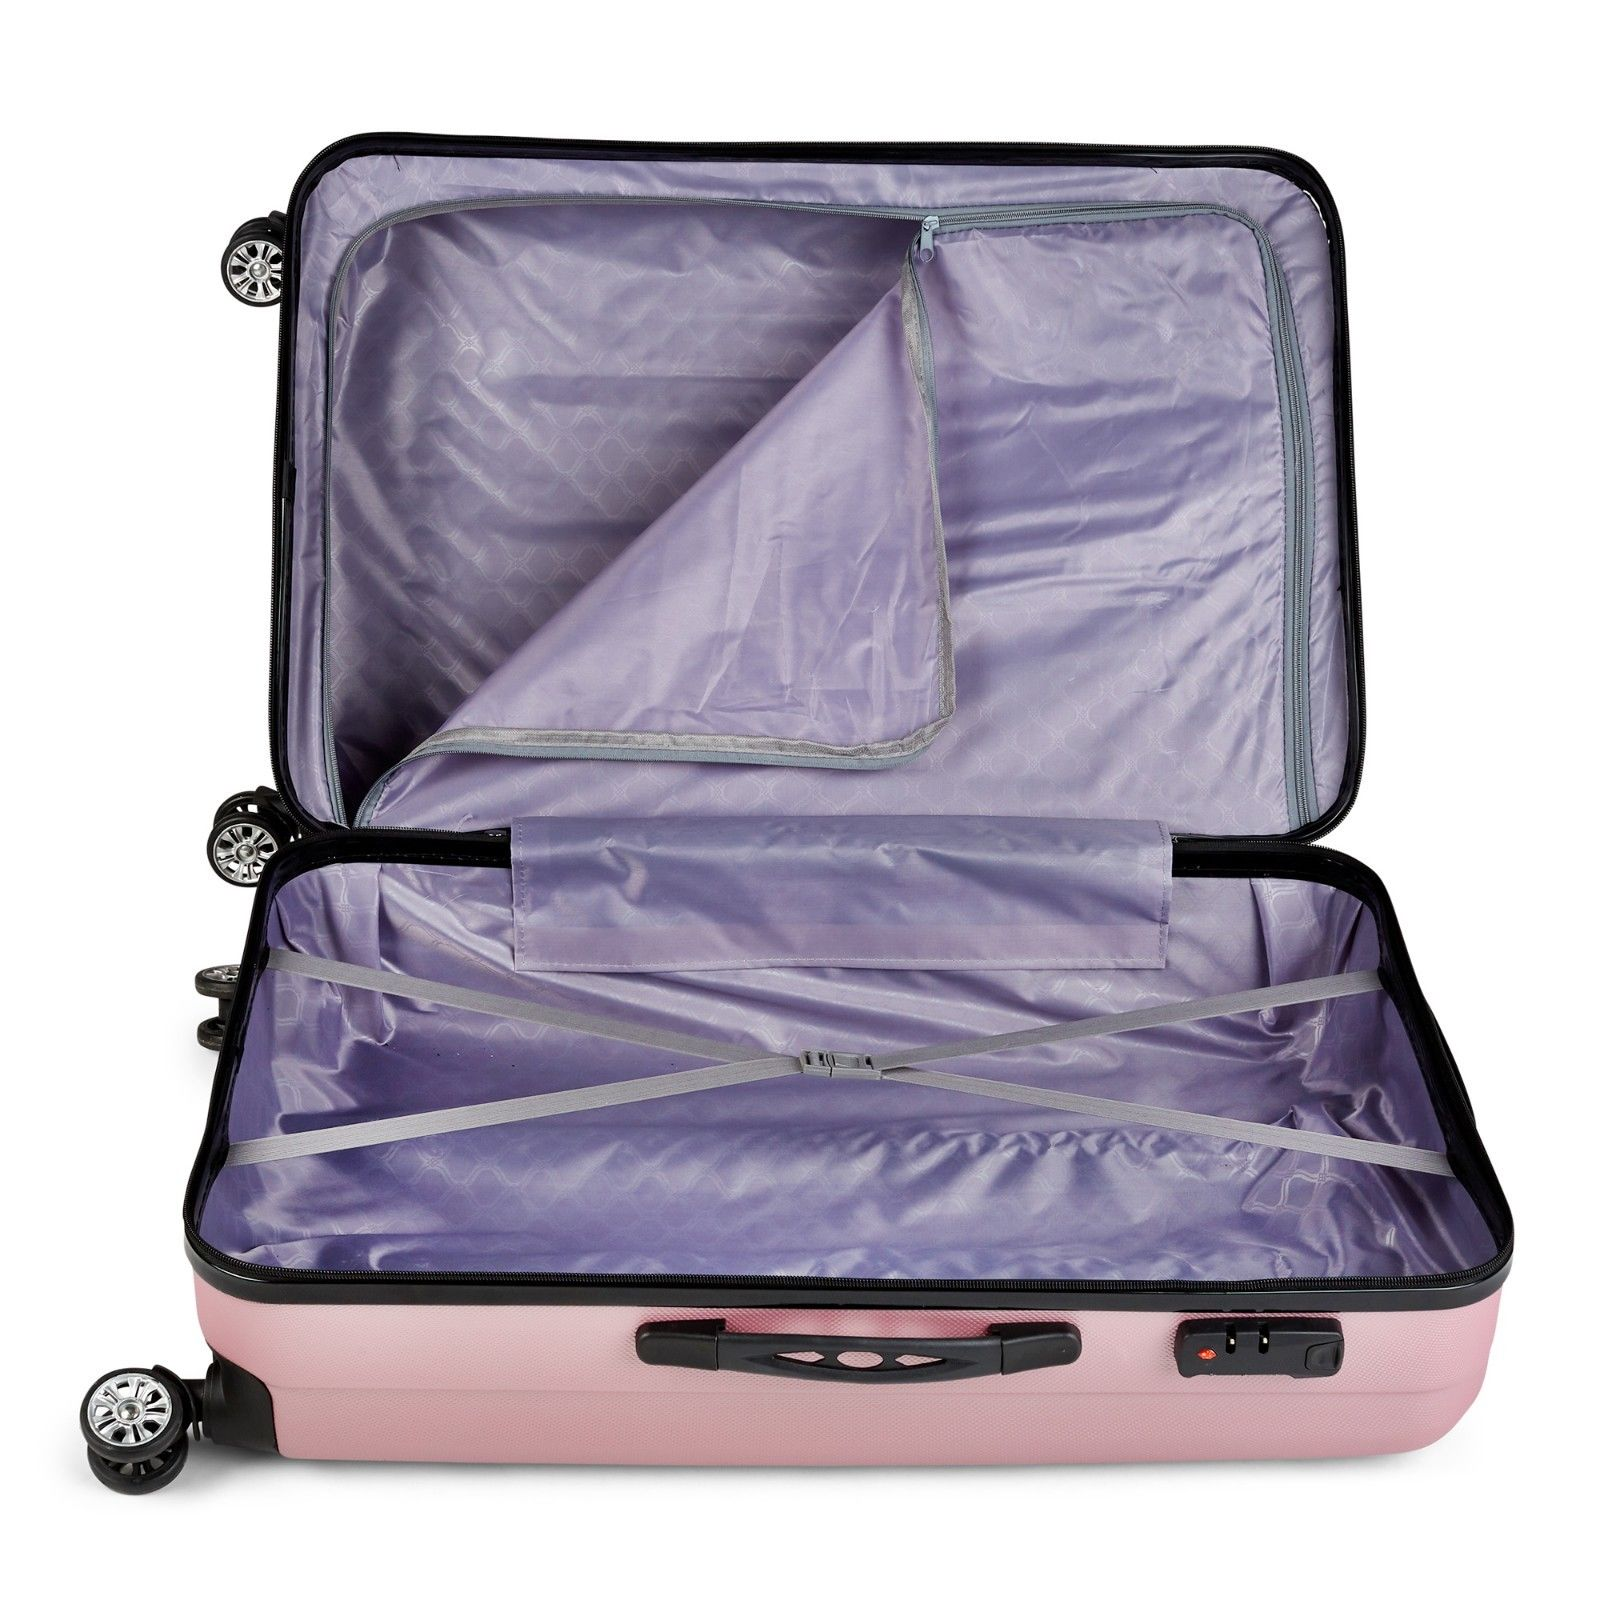 Milano-Premium-3pc-ABS-Luggage-Suitcase-Luxury-Hard-Case-Shockproof-Travel-Set thumbnail 26